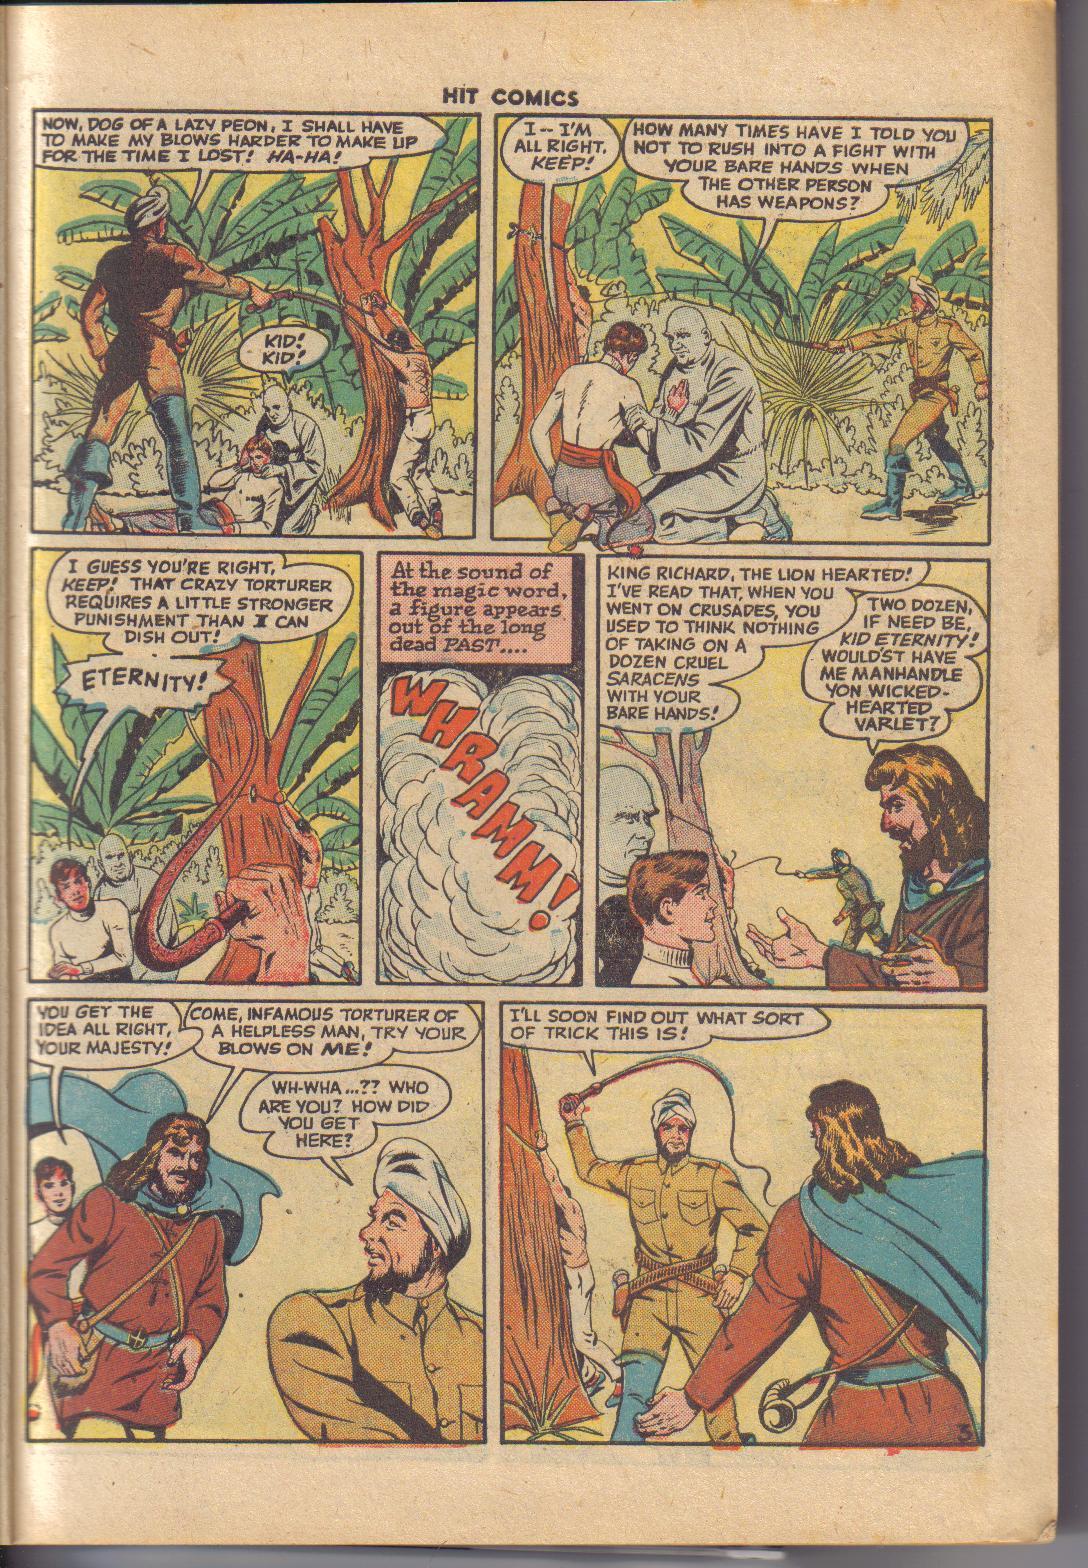 Read online Hit Comics comic -  Issue #45 - 5